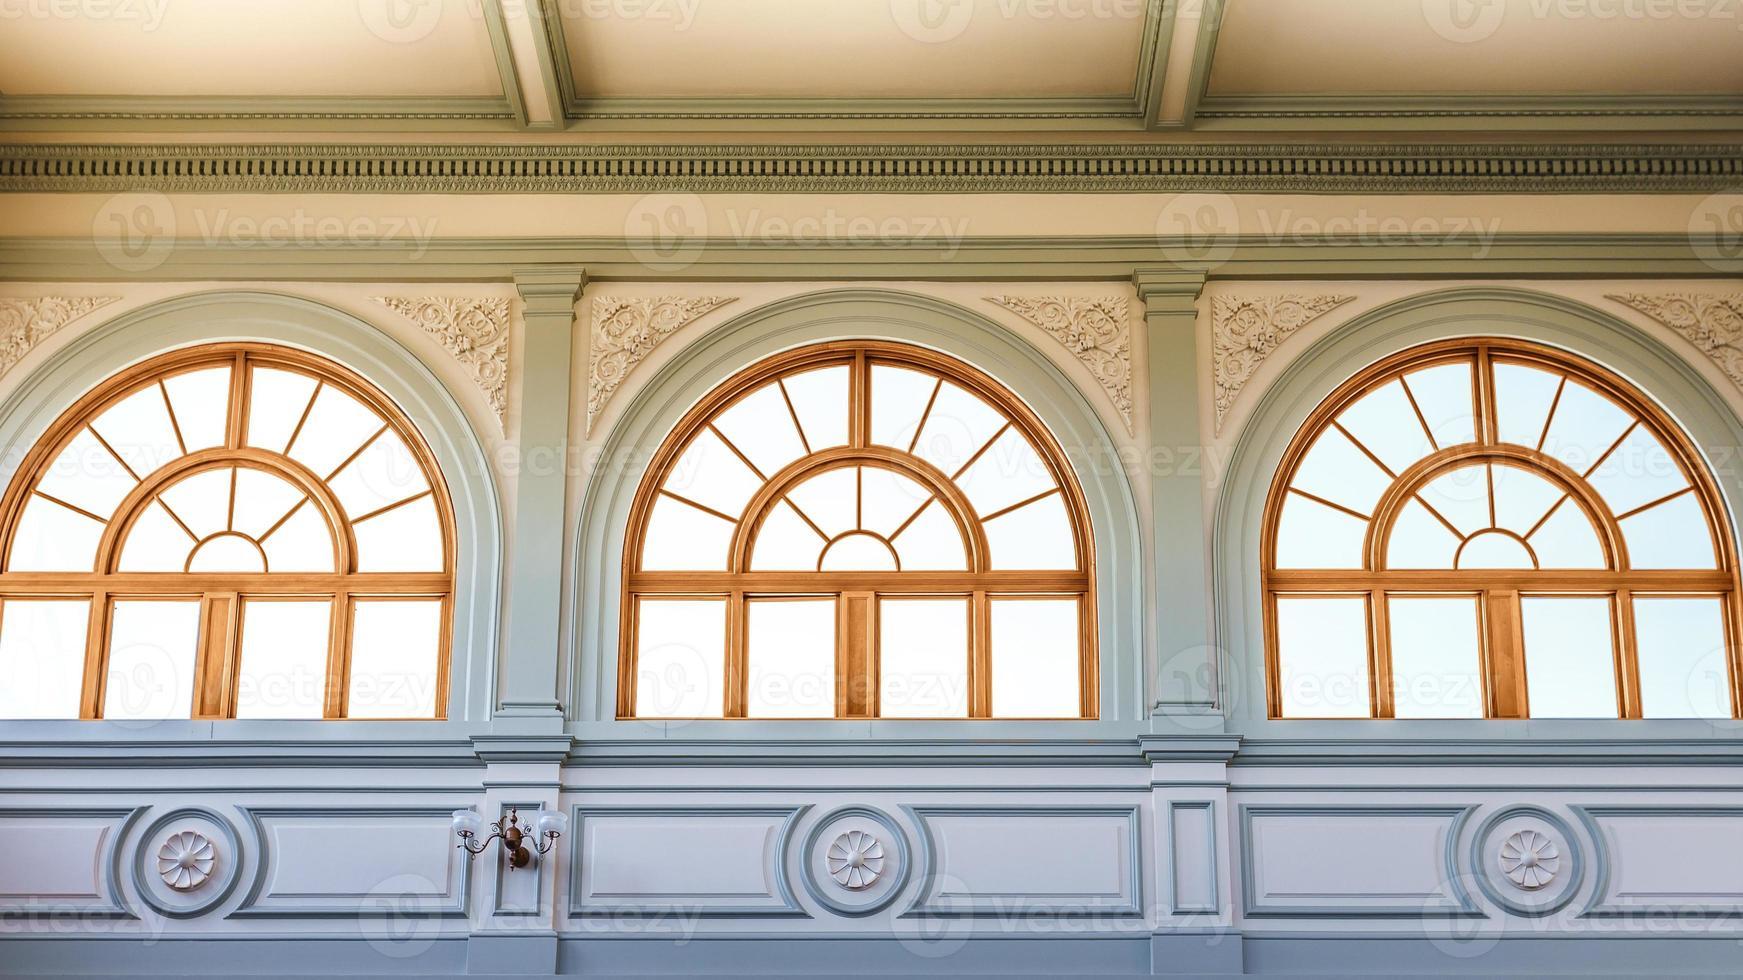 Windows of Atlanta Capitol photo